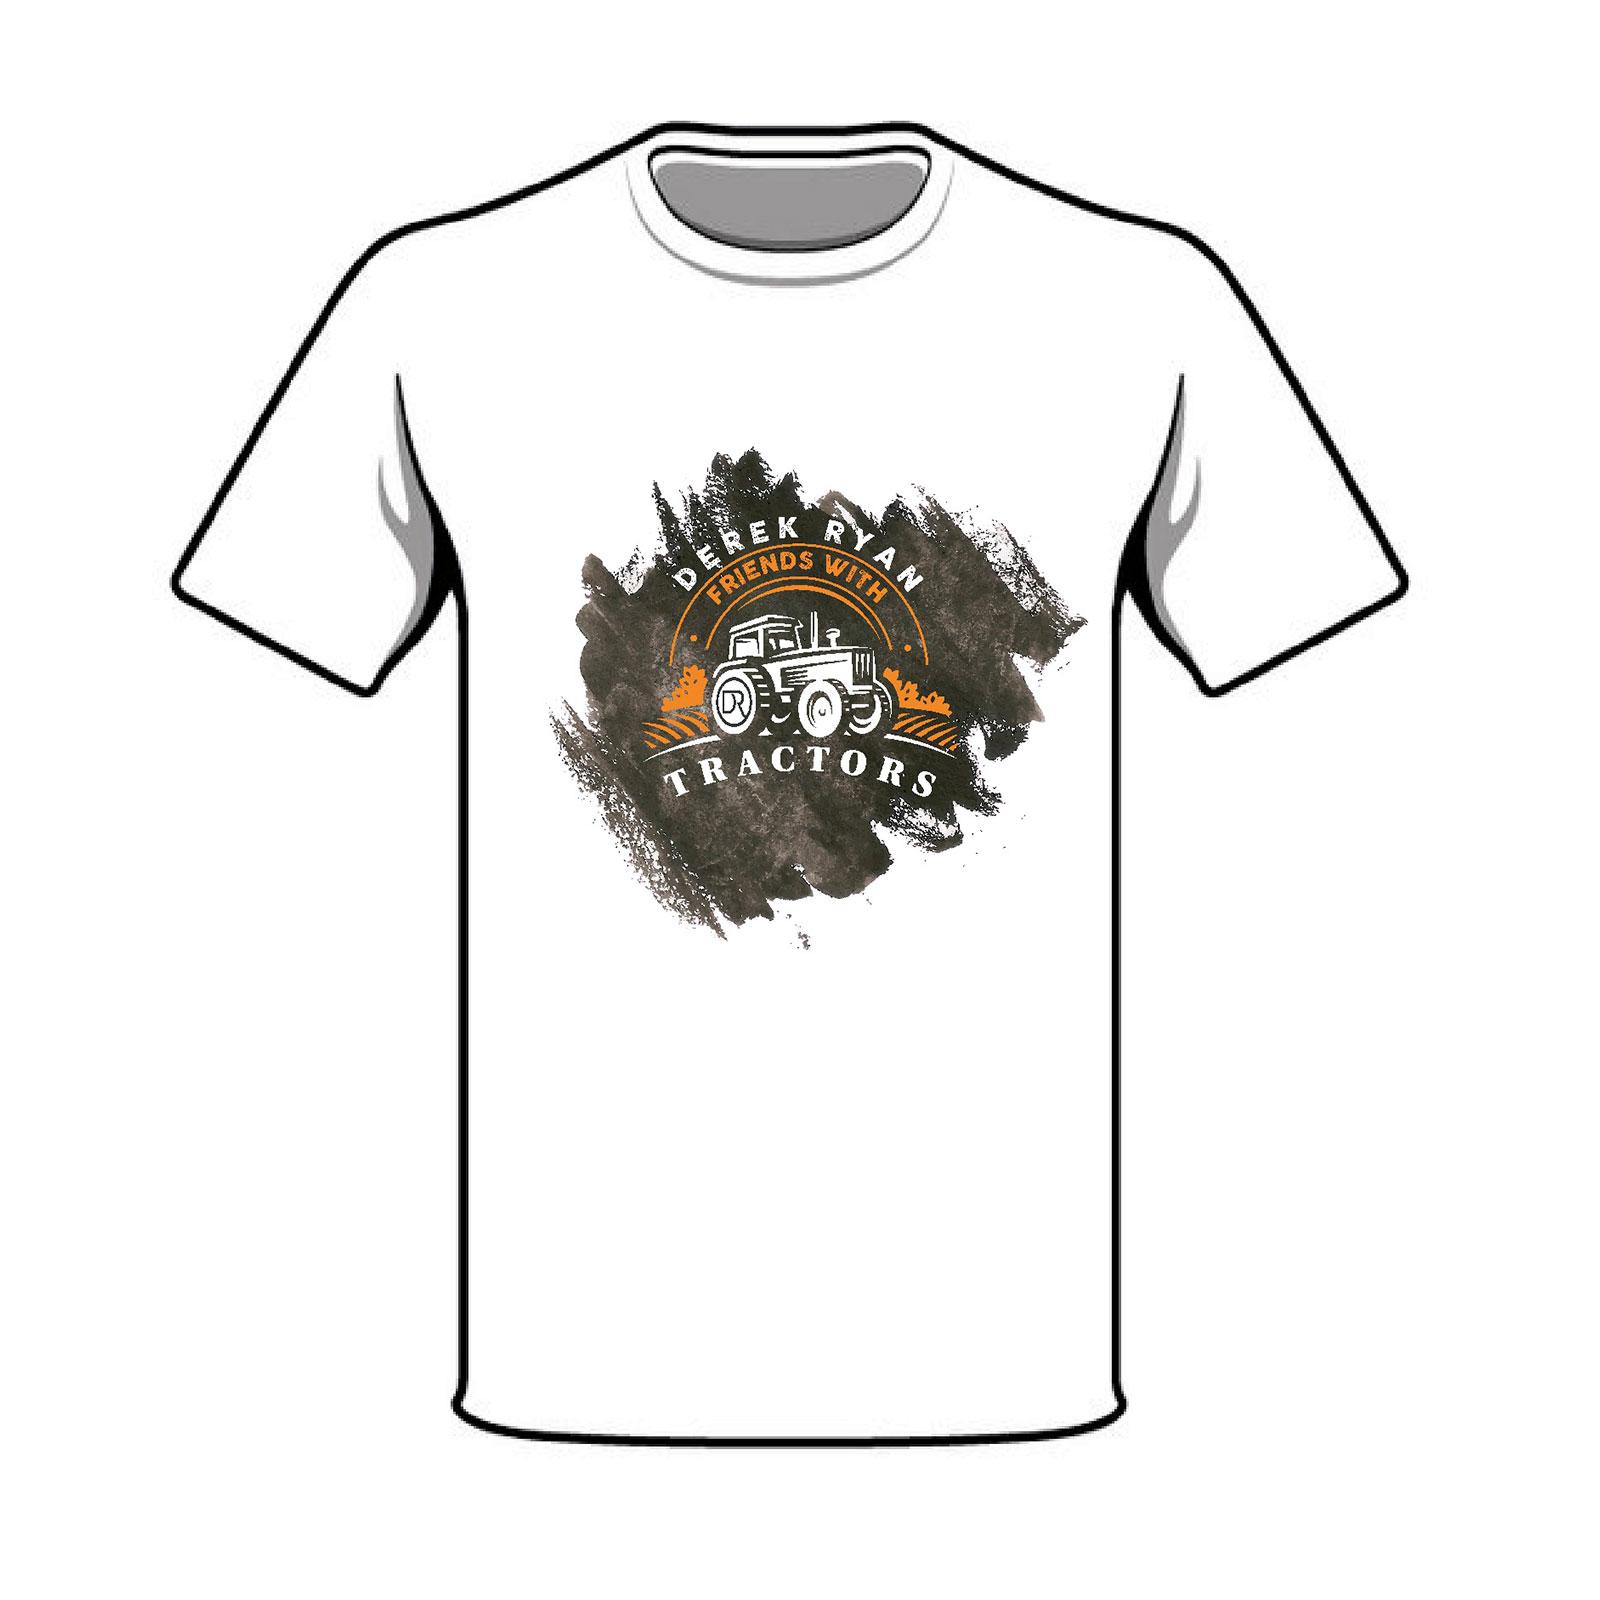 t-shirt-derek-ryan-music-tractors